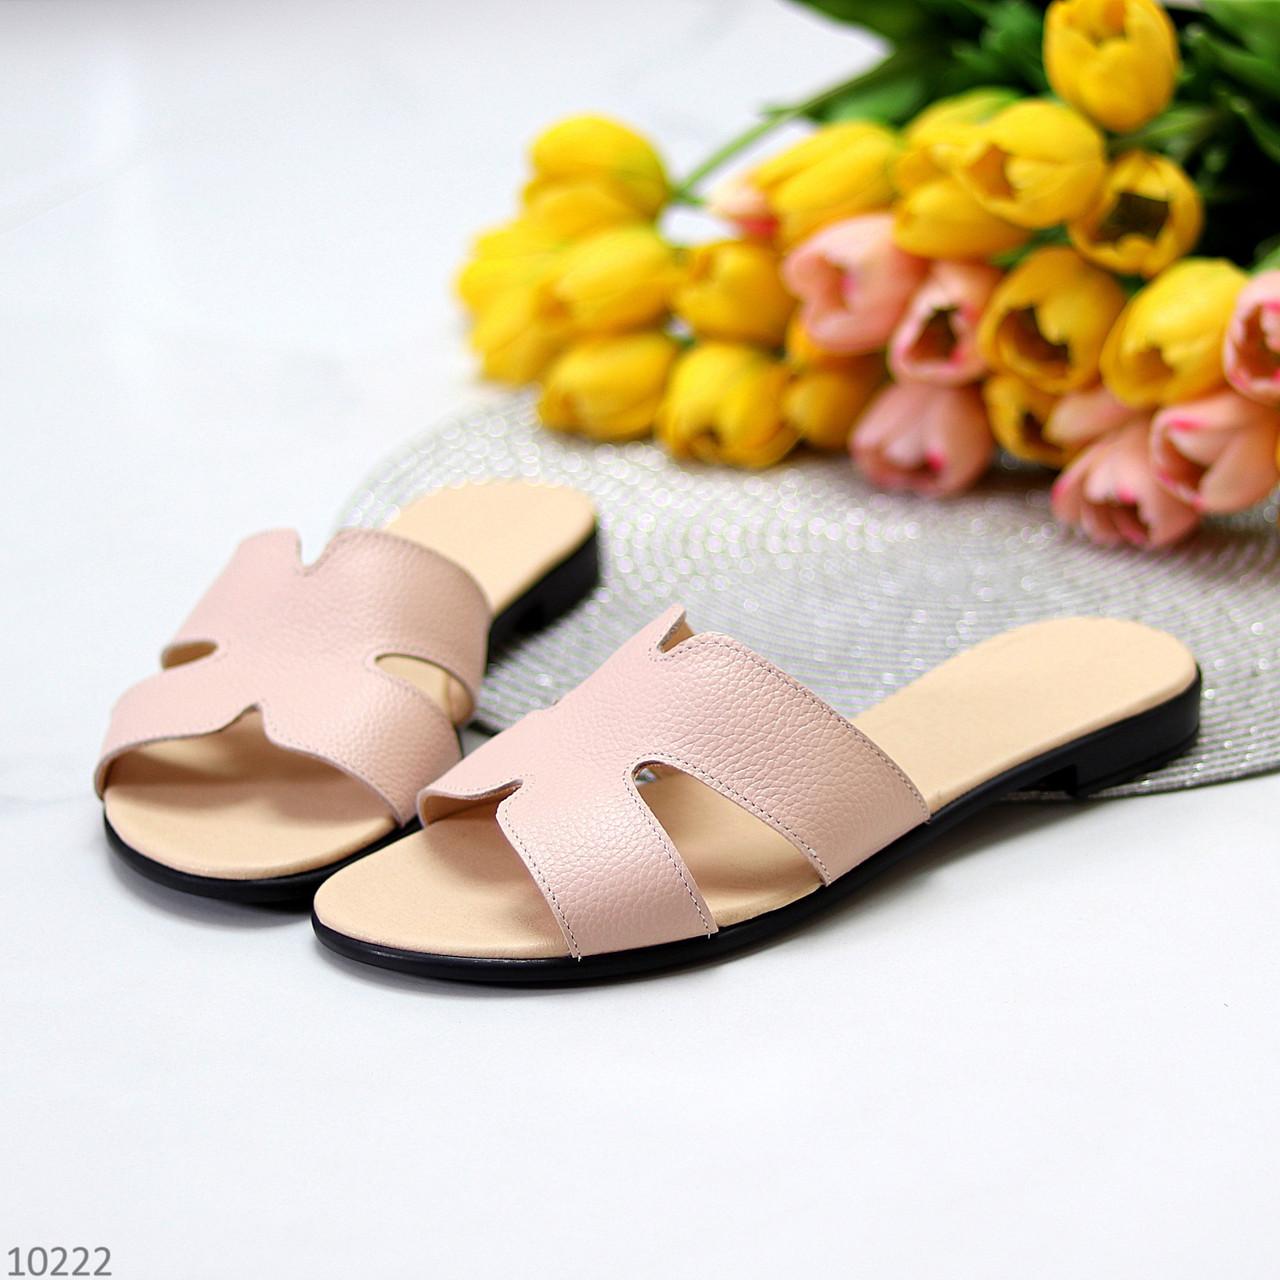 Шлепанцы женские розовые/ пудра натуральная кожа